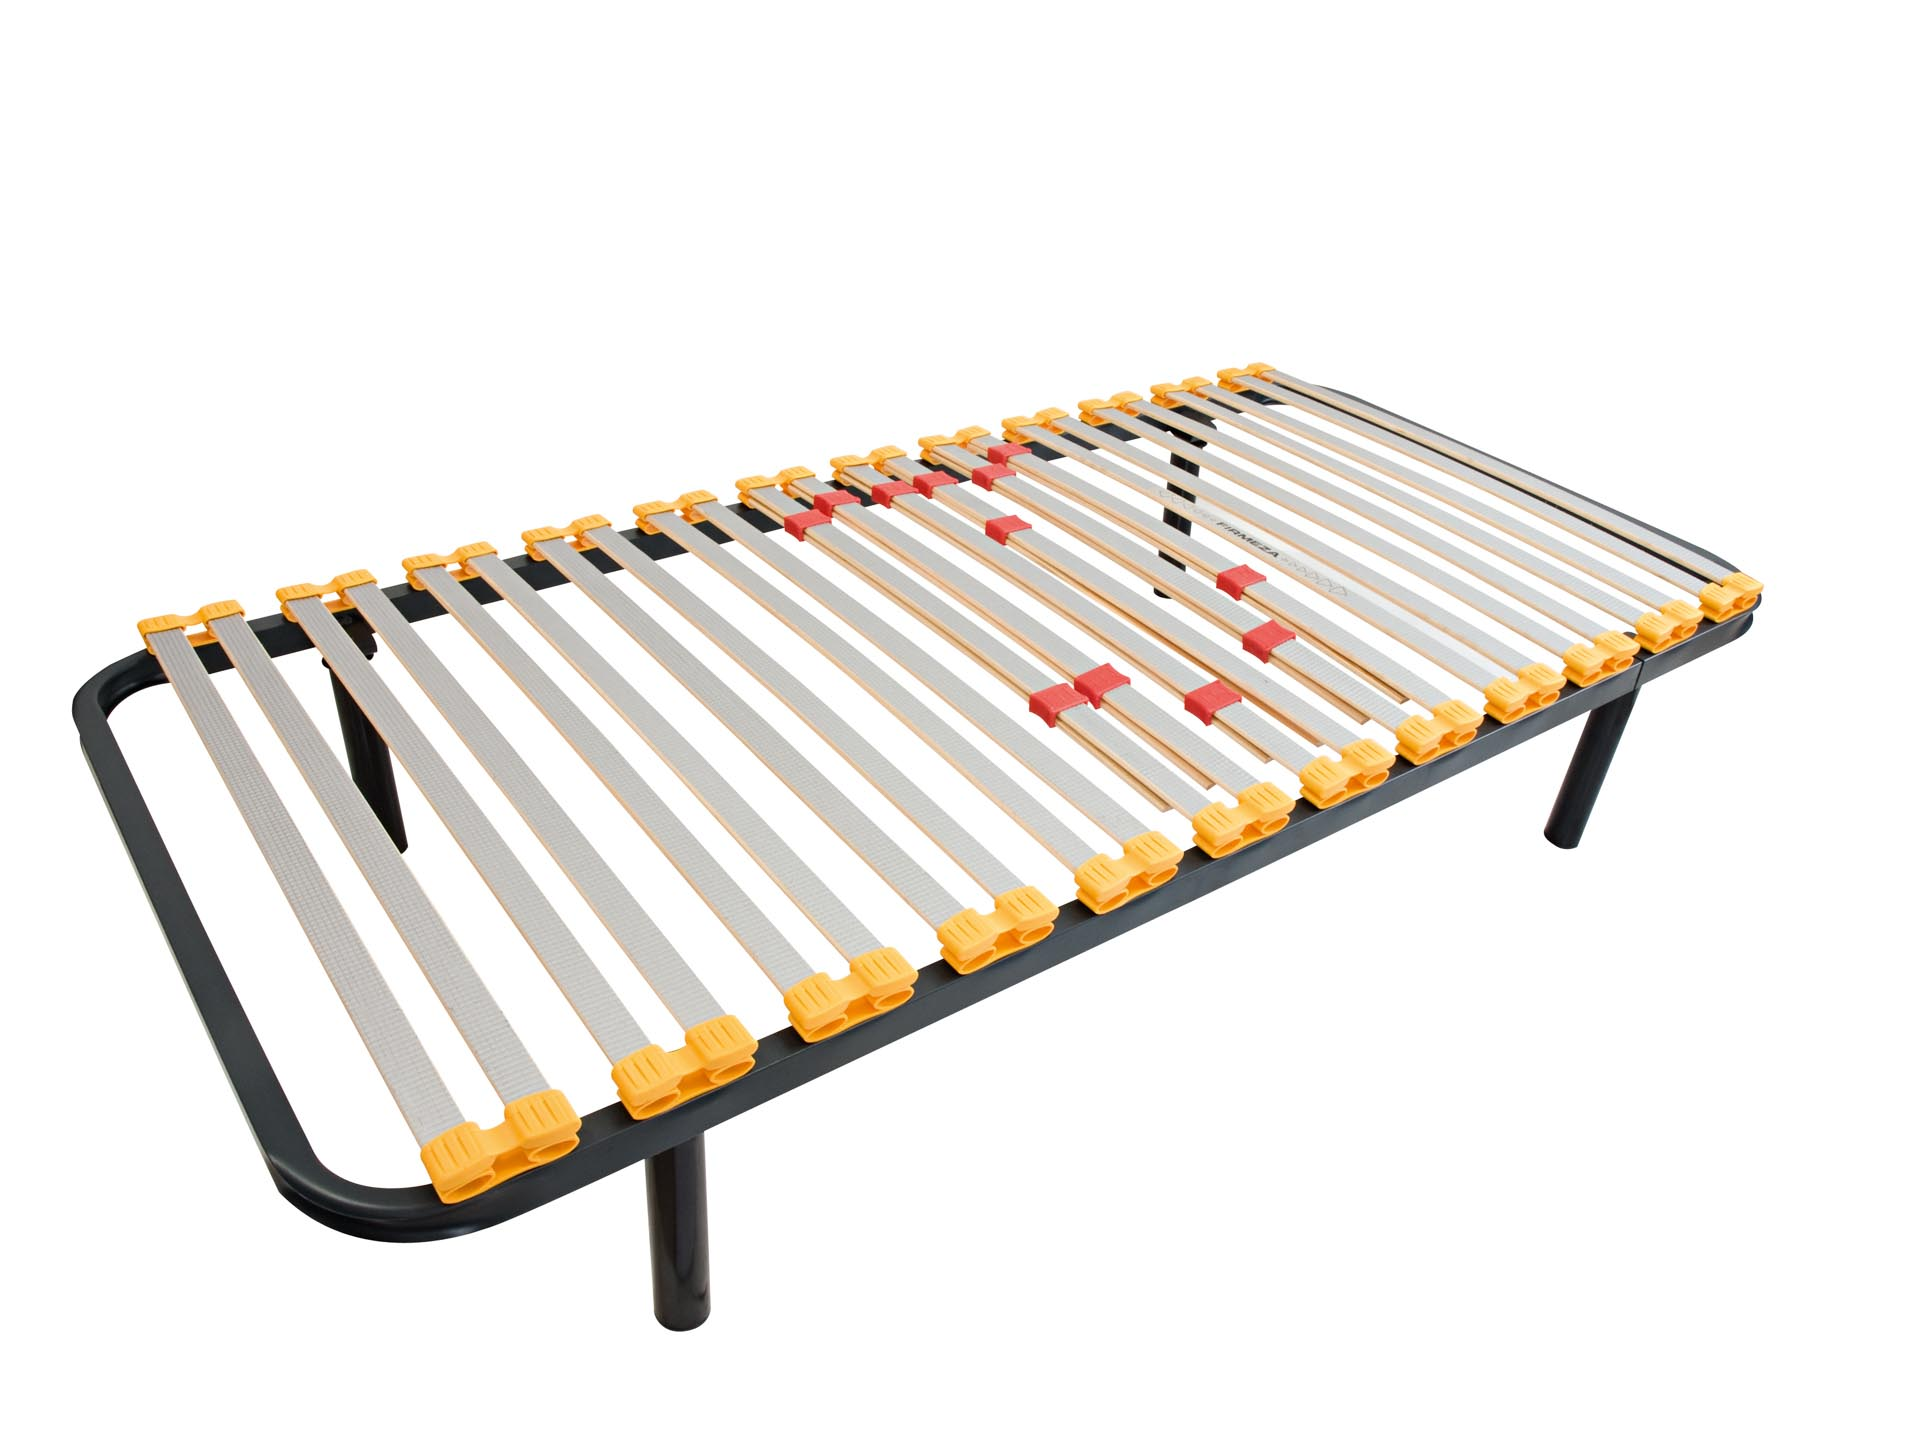 Bases de camas para geriátricos e instalaciones hospitalarias